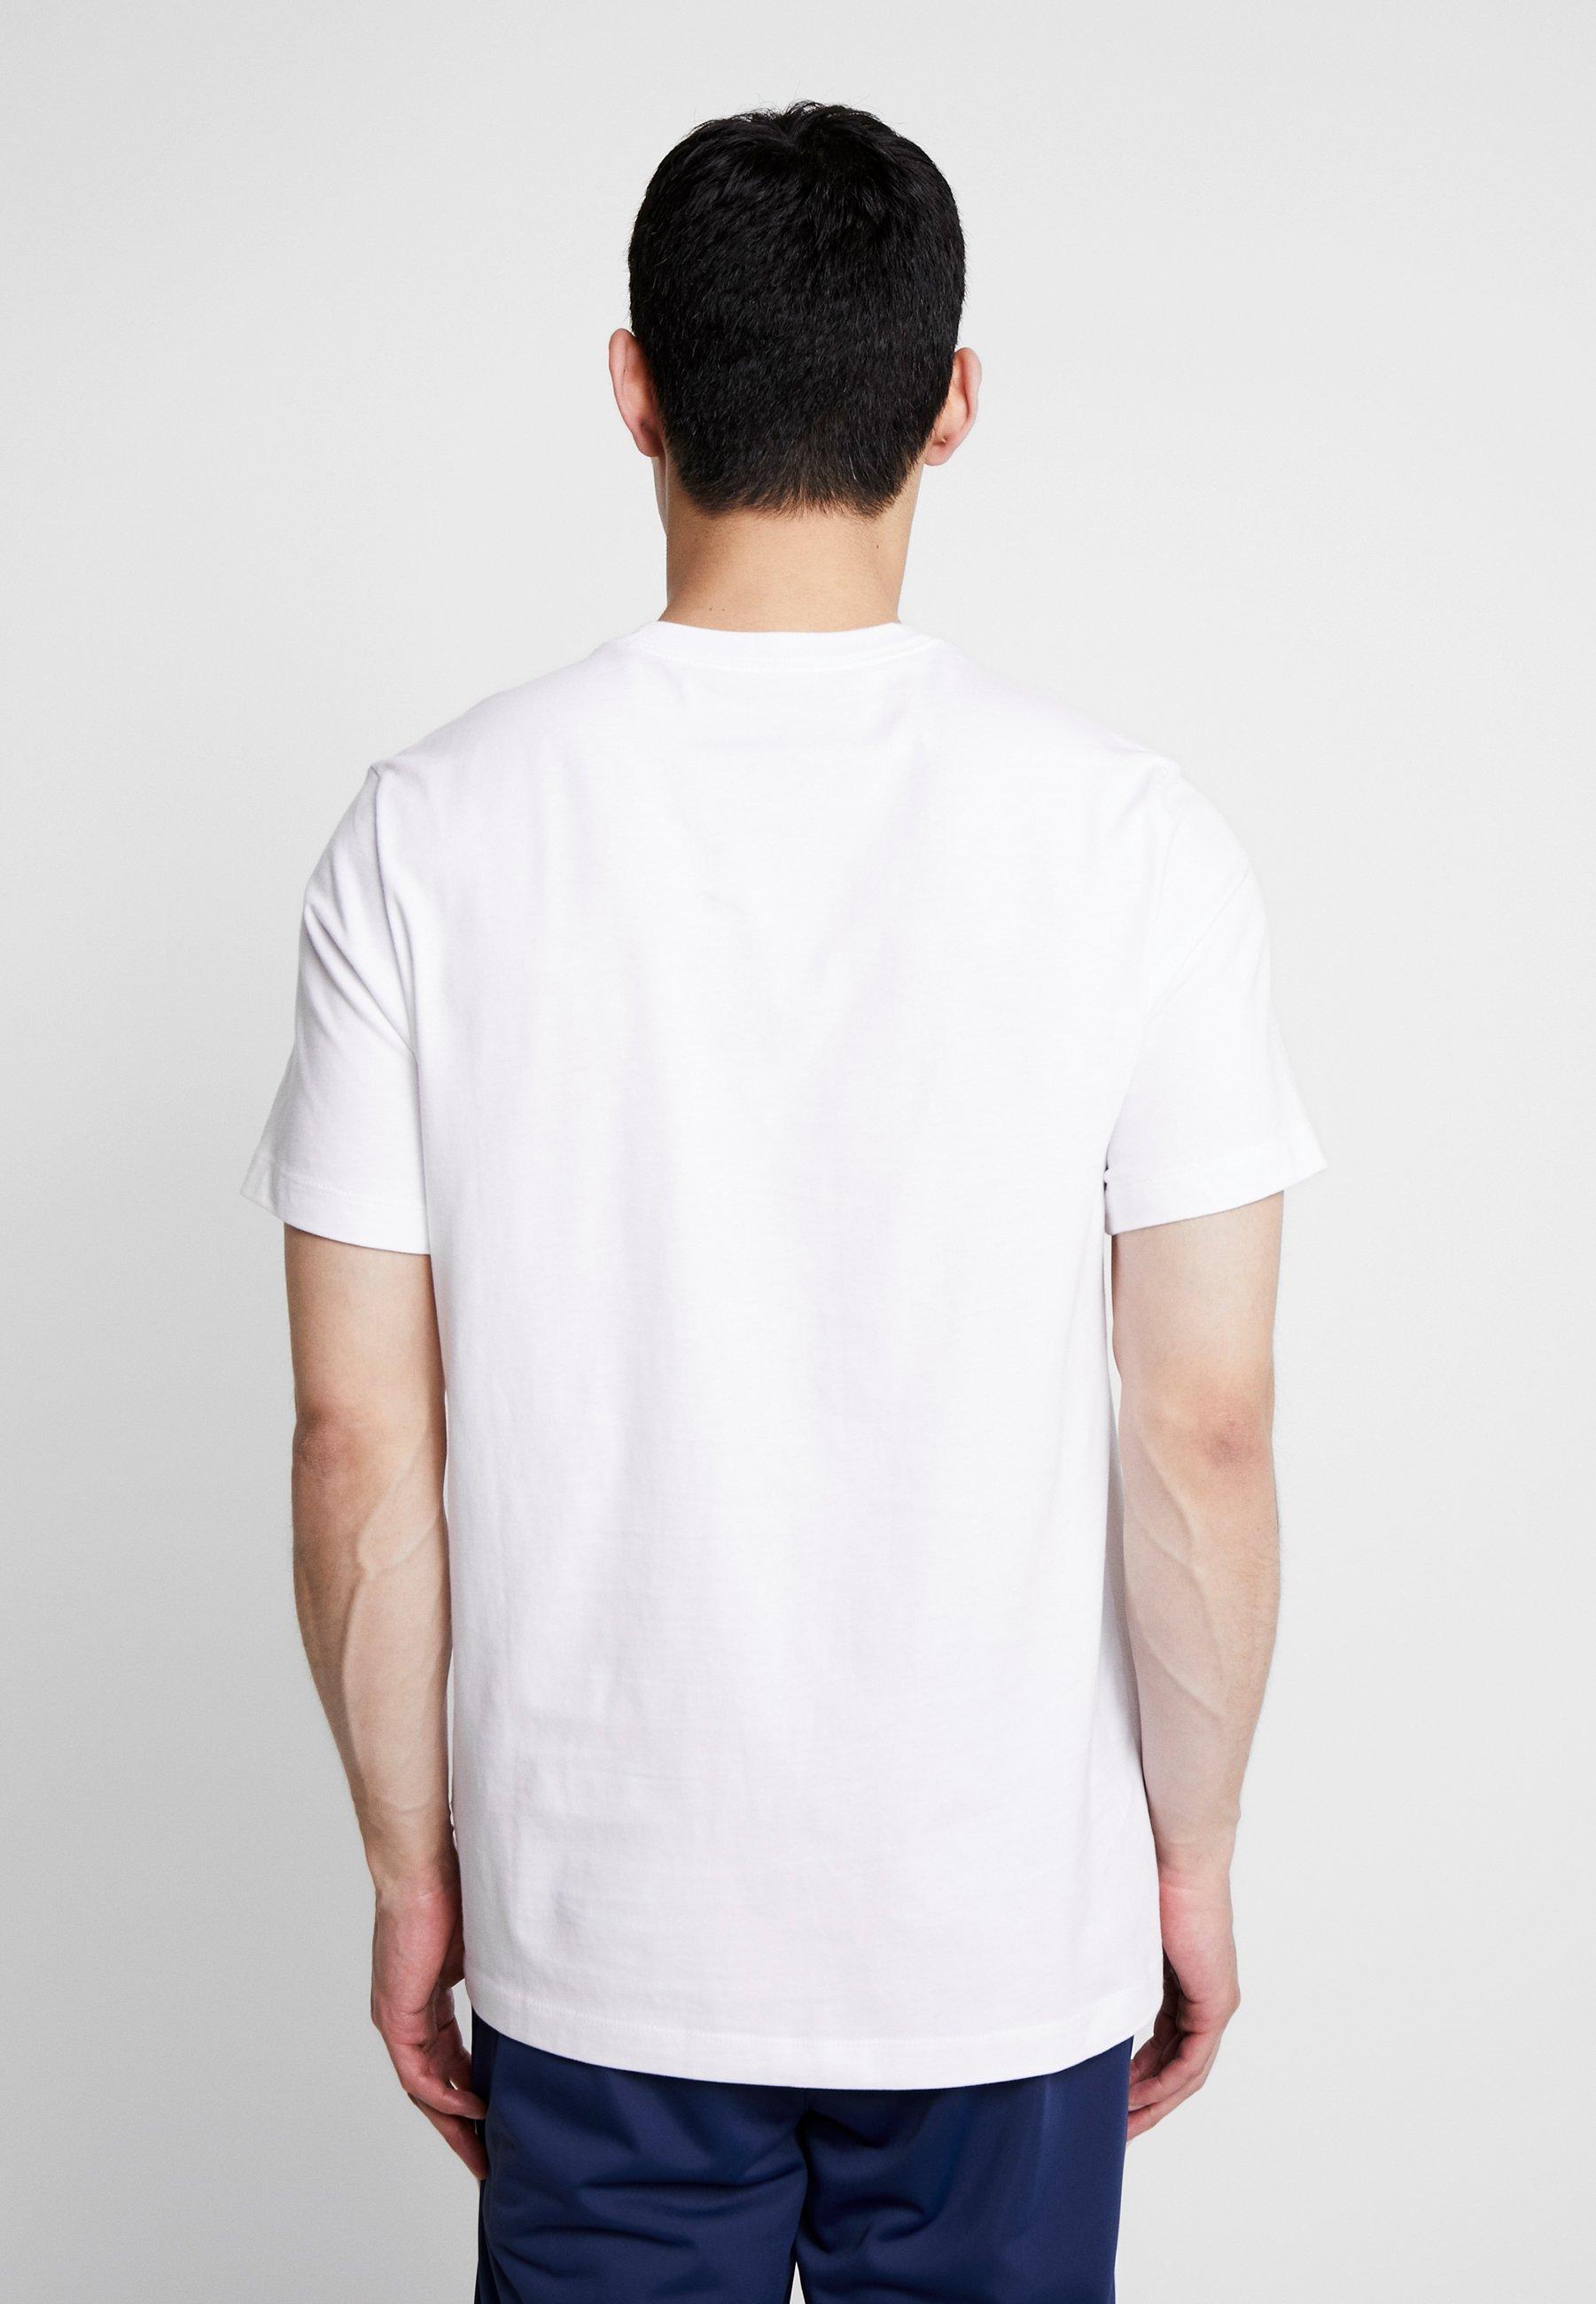 Sportswear CamoT Imprimé shirt White Nike Tee wolf Grey 76gfyvYb